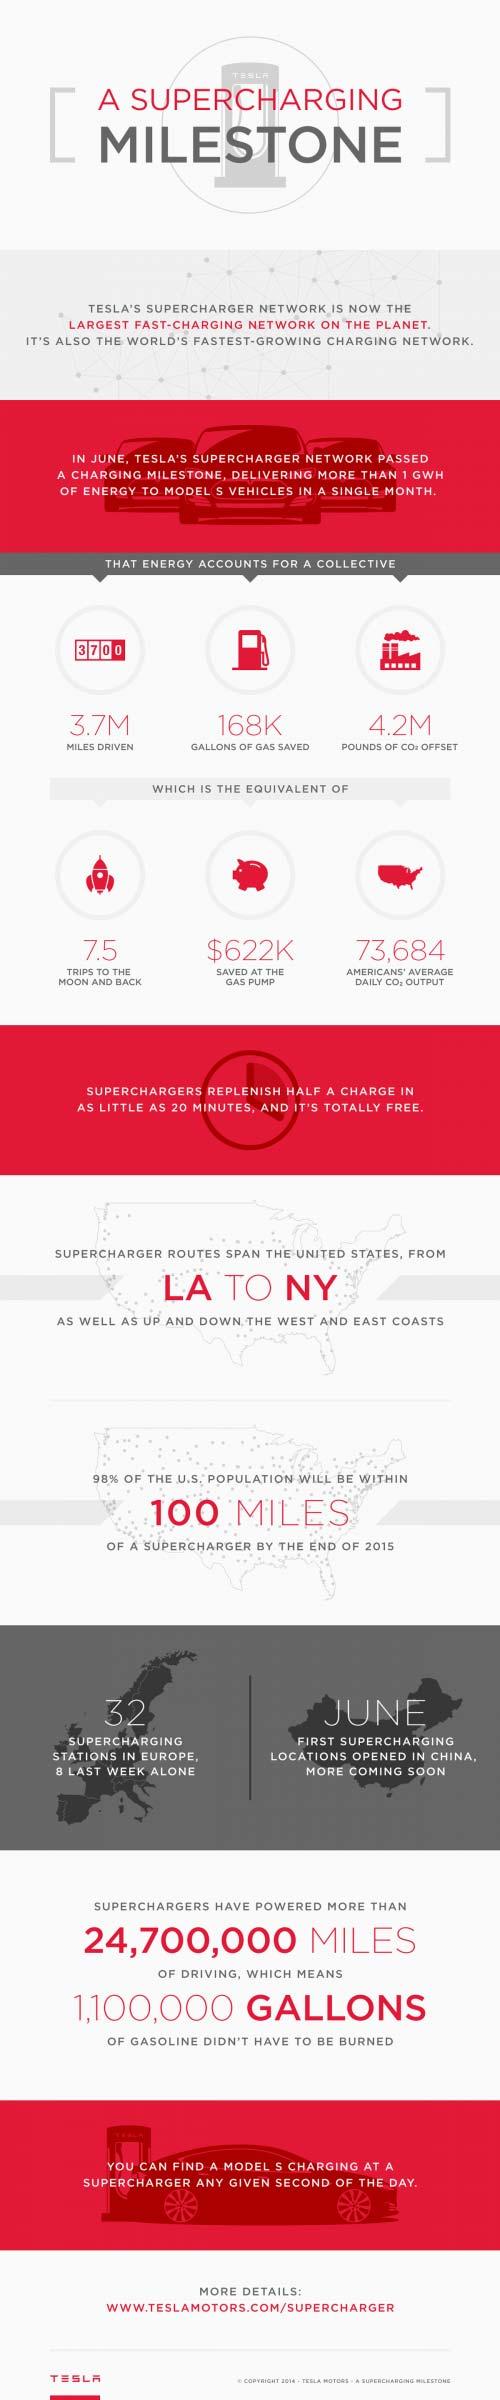 Tesla-Supercharger-Infographic